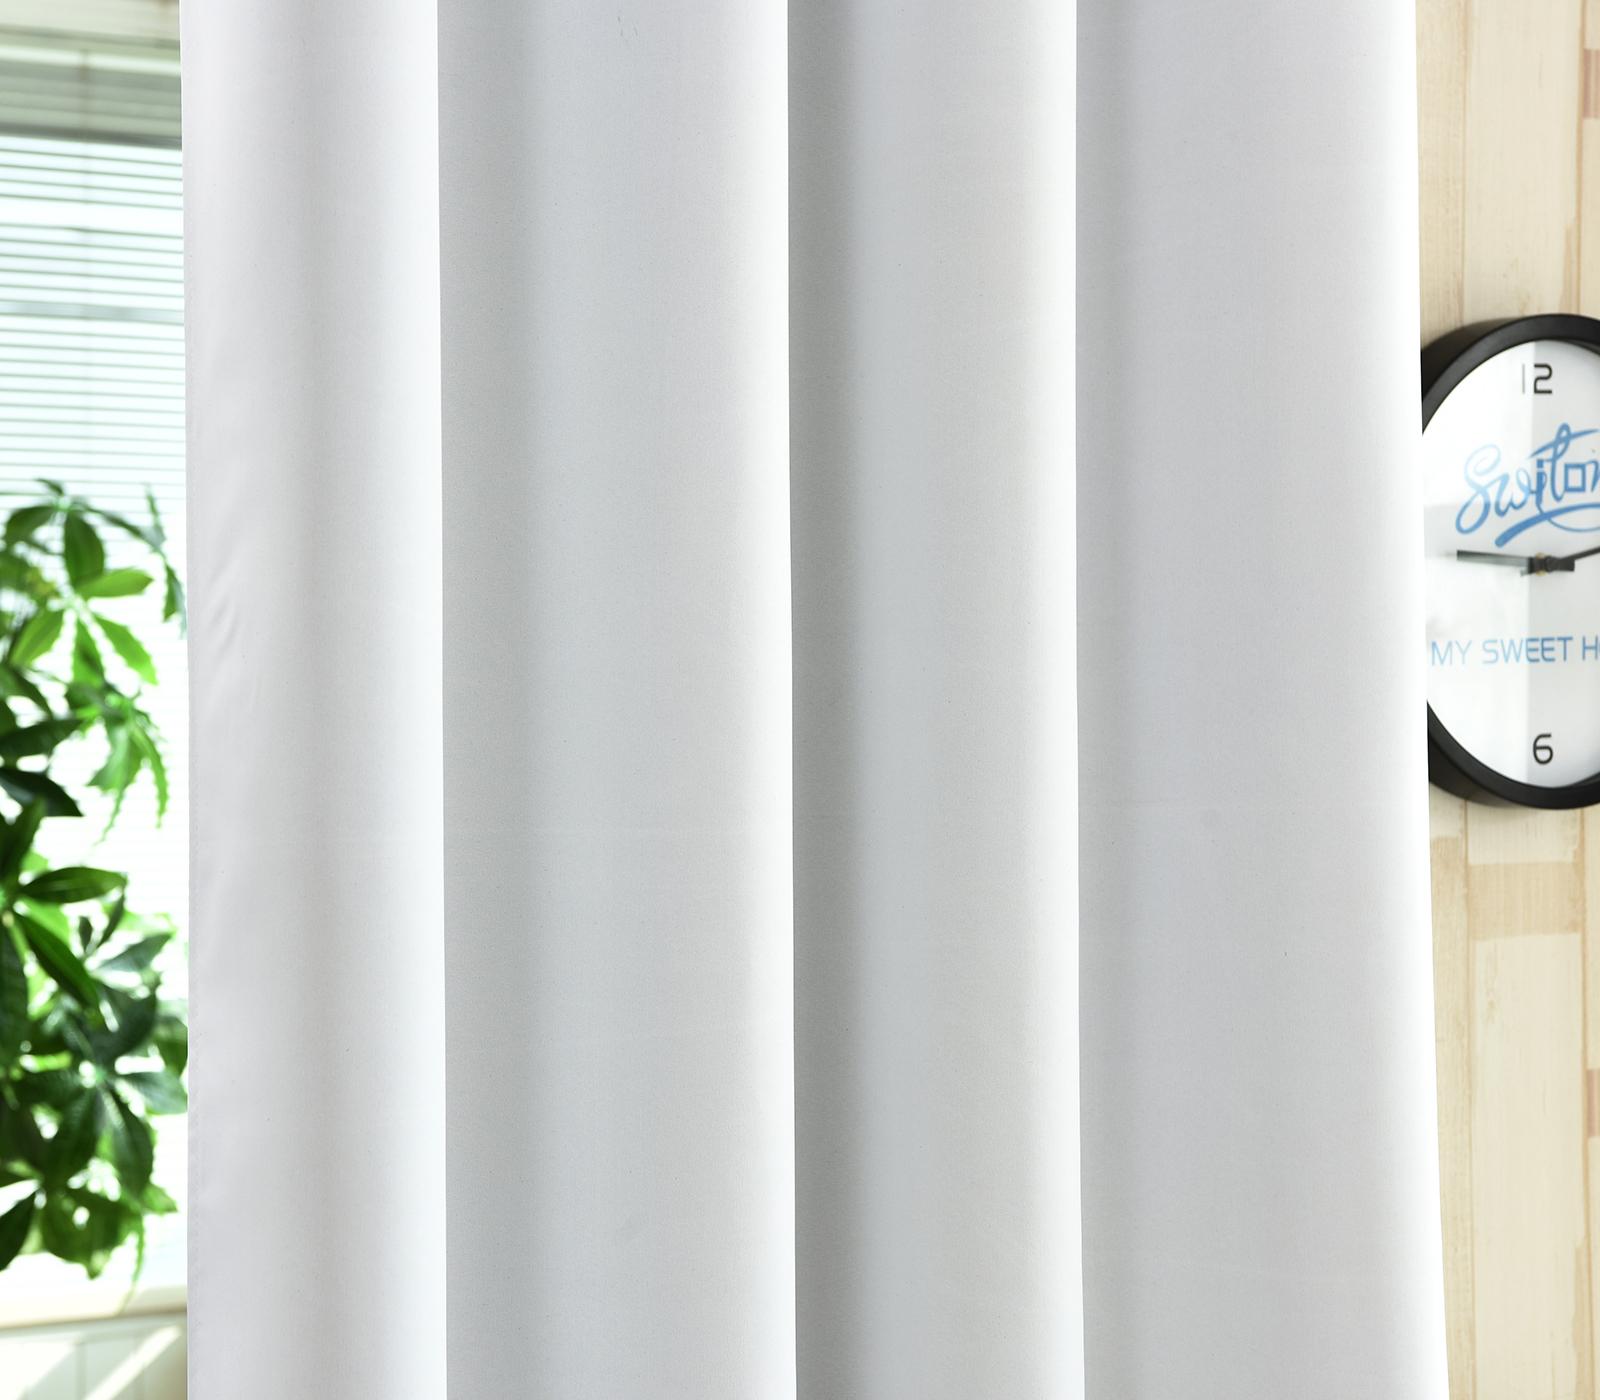 2er set gardine blickdicht senschal thermo vorhang 135x175cm weiss vh5867ws 2 ebay. Black Bedroom Furniture Sets. Home Design Ideas